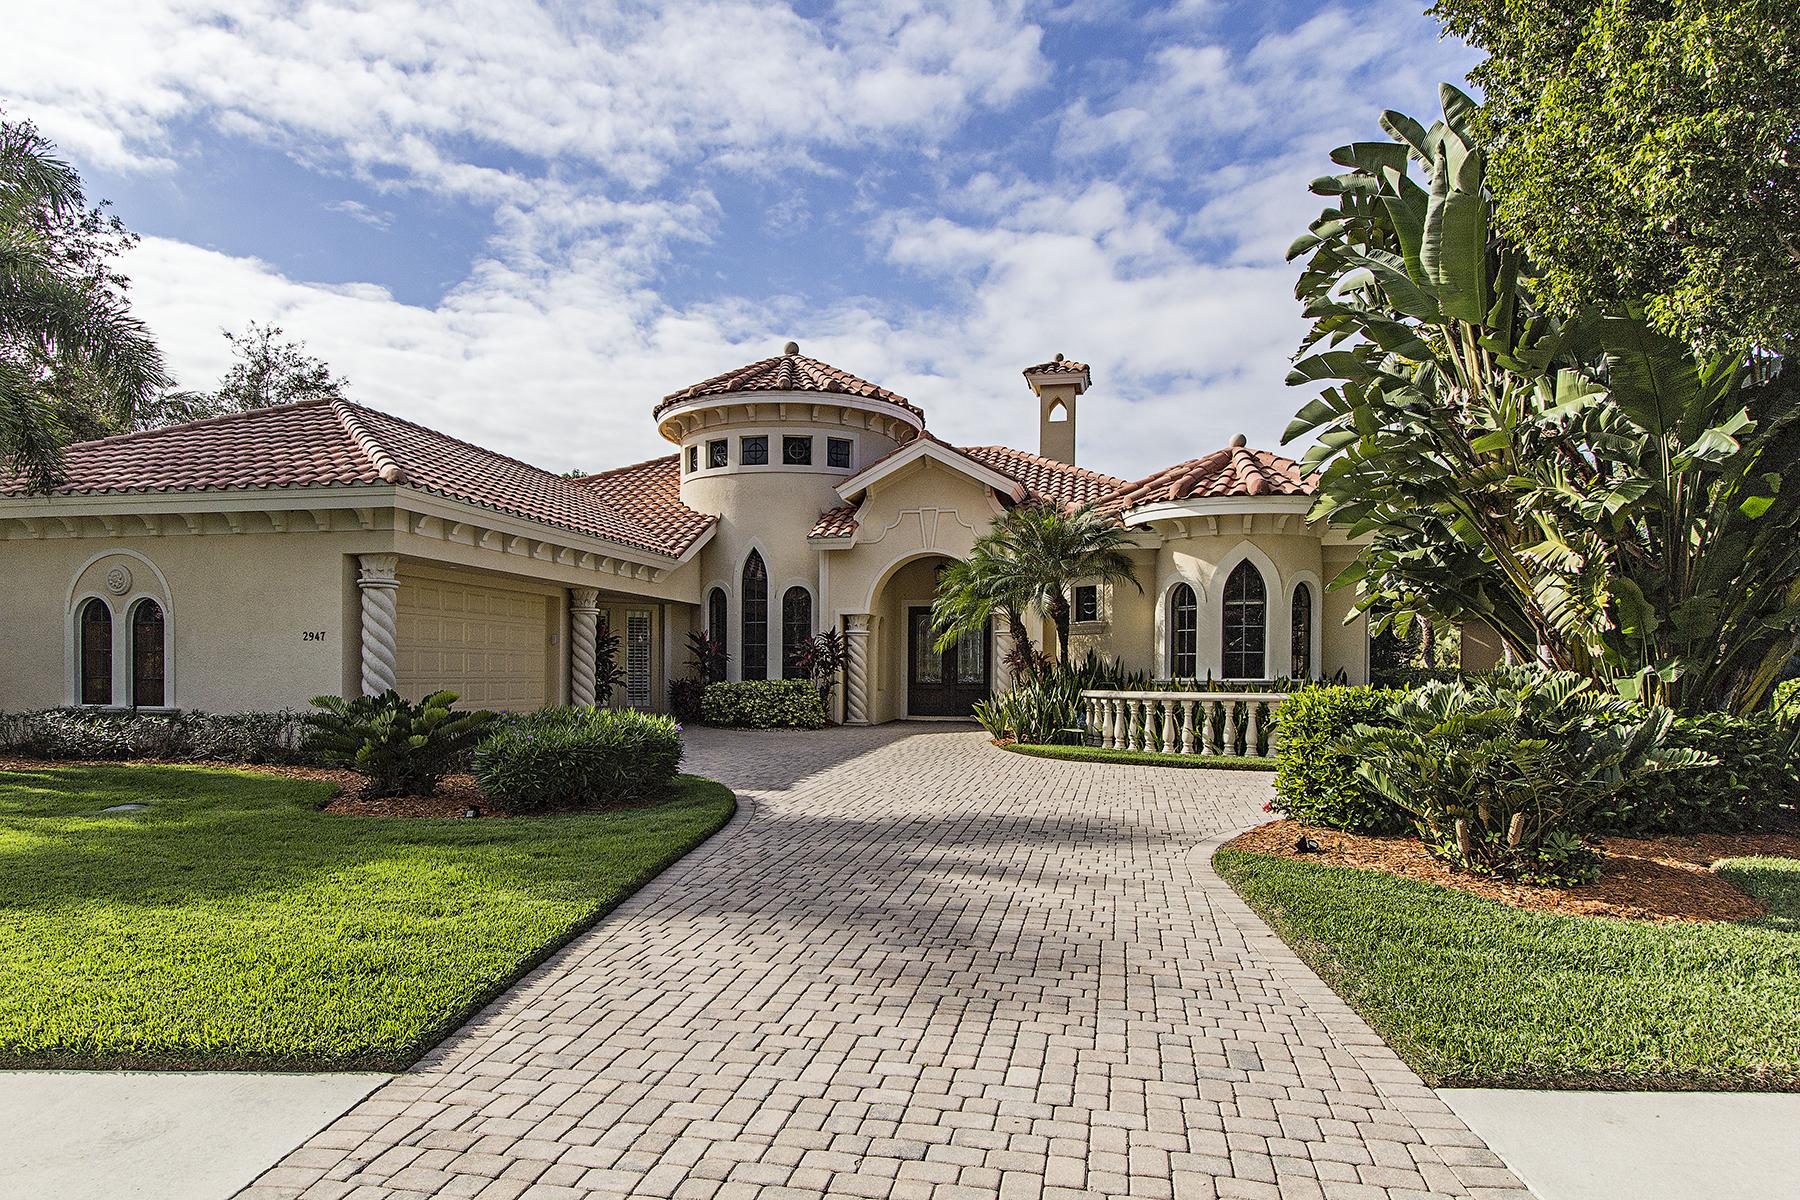 Single Family Home for Sale at Naples 2947 Mona Lisa Blvd Naples, Florida, 34119 United States